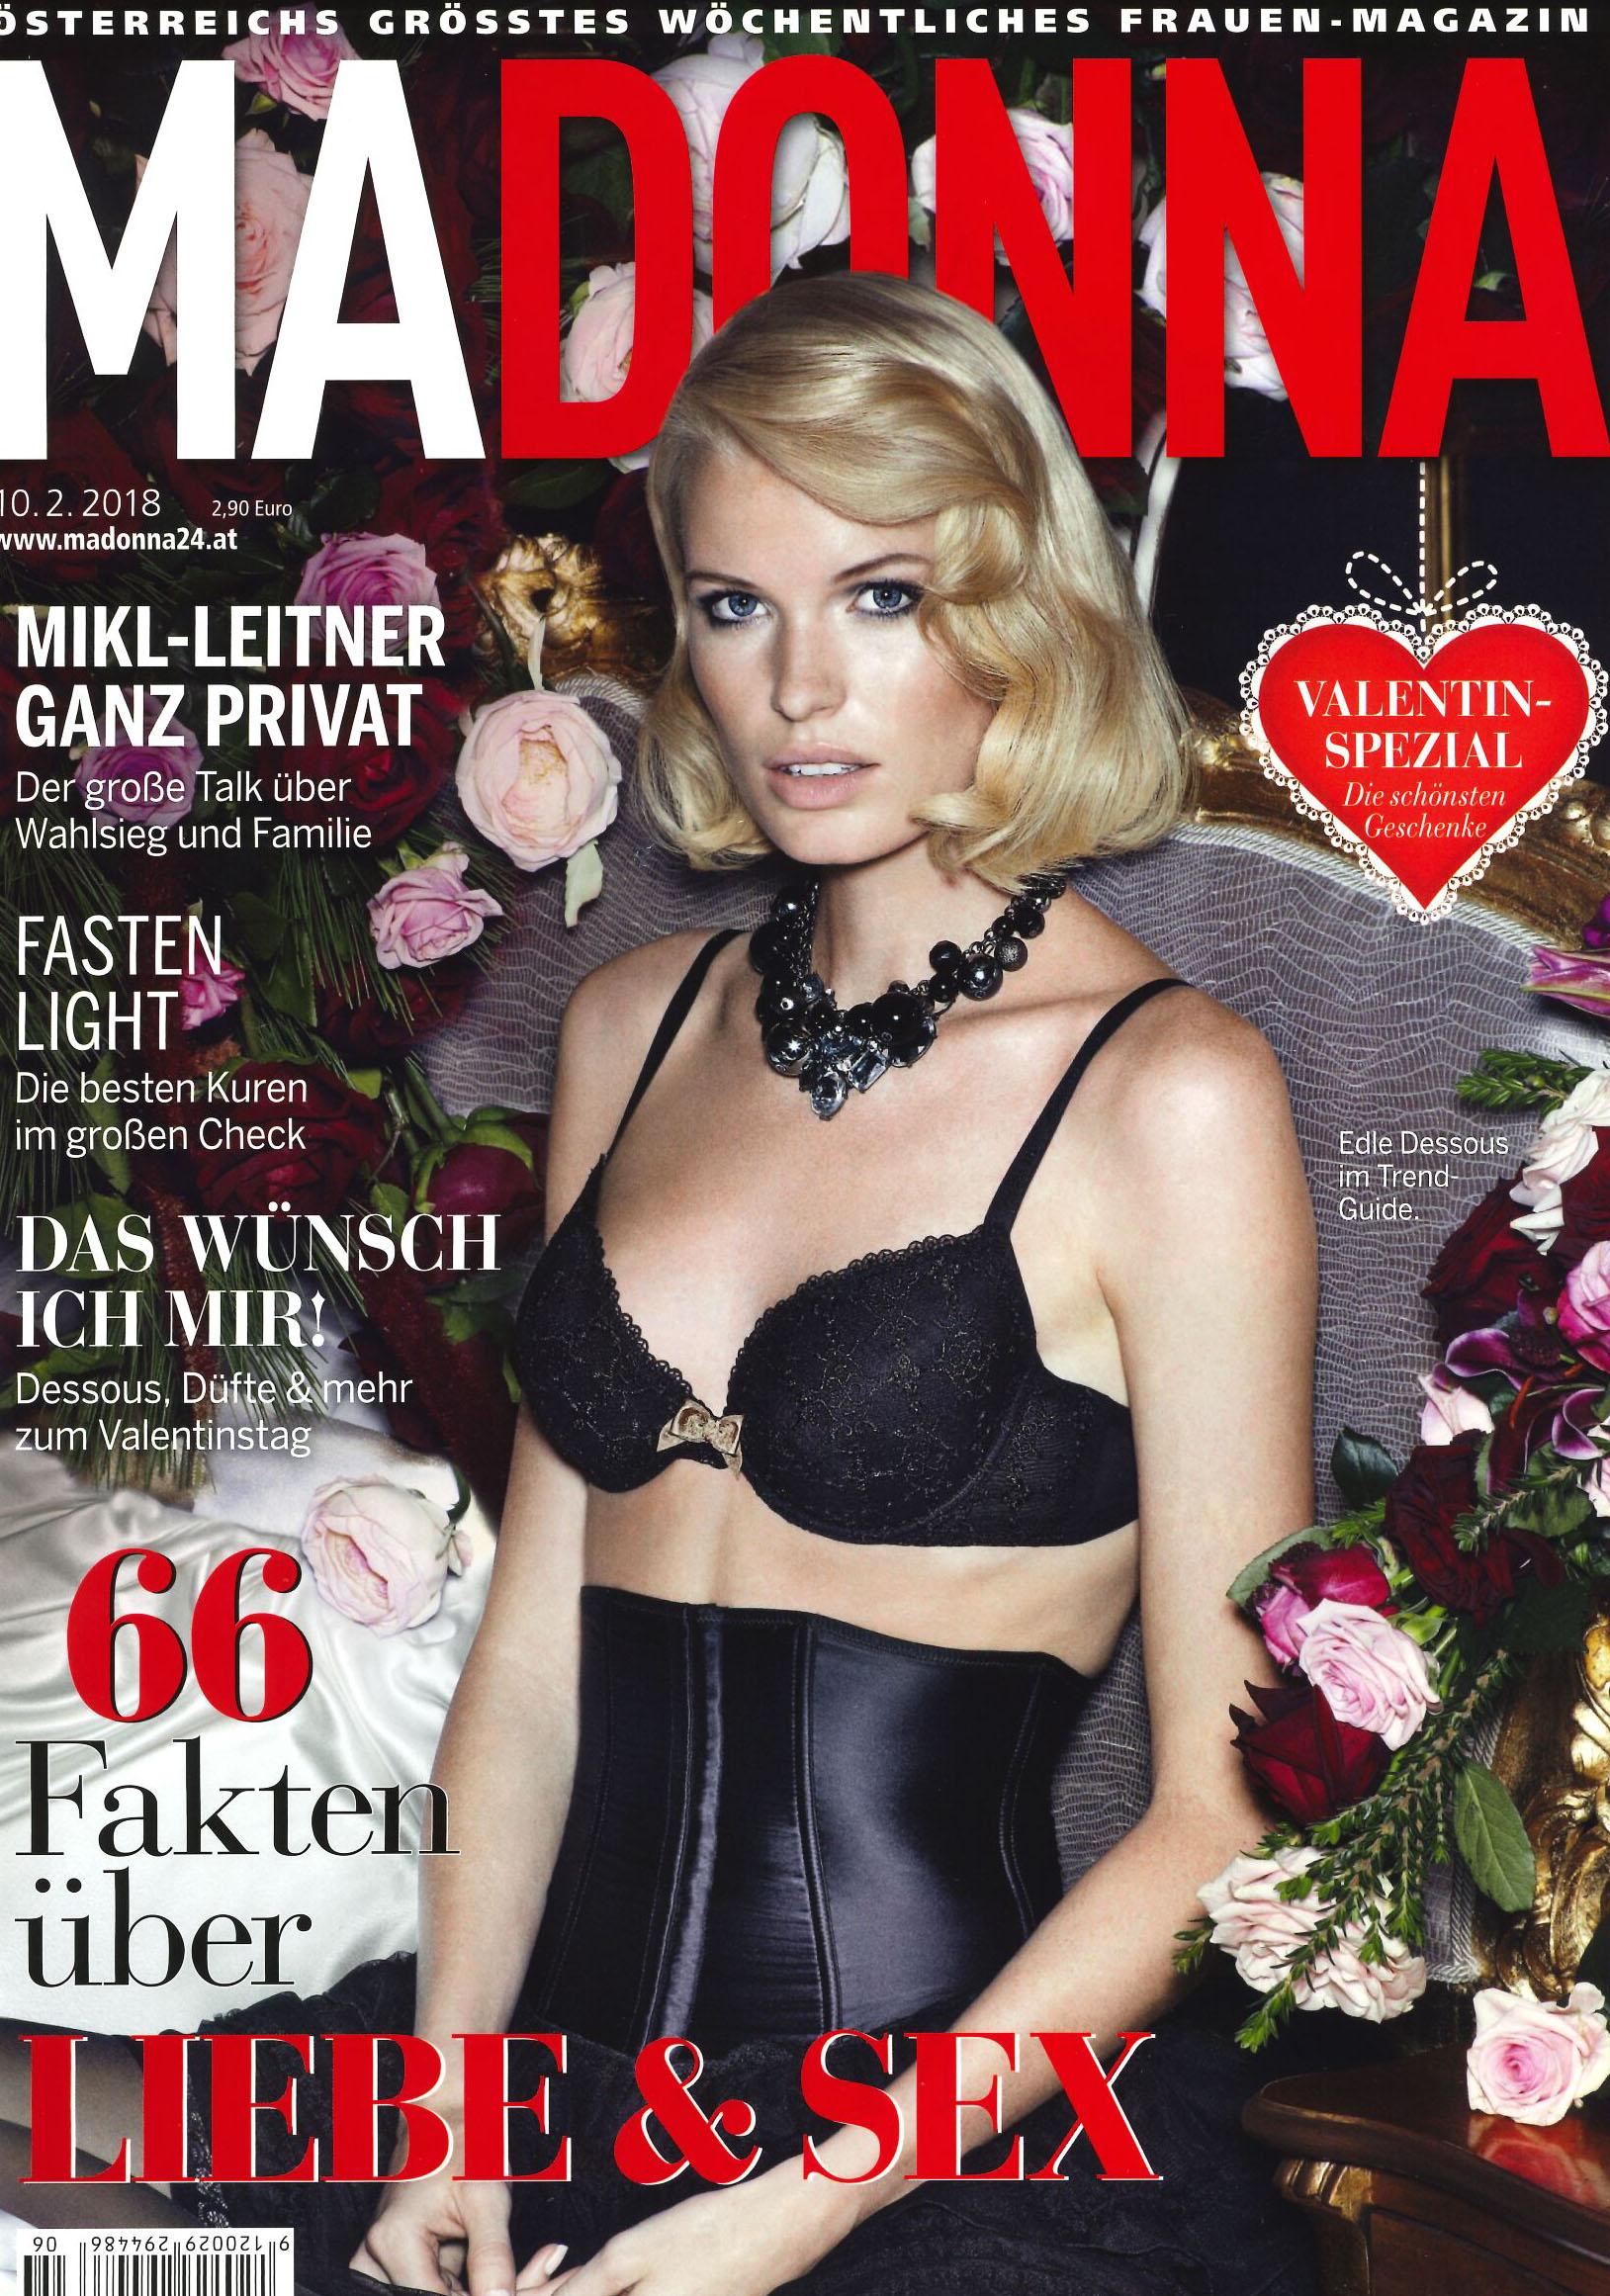 Beauty zum Verlieben,   Madonna im Februar 2018